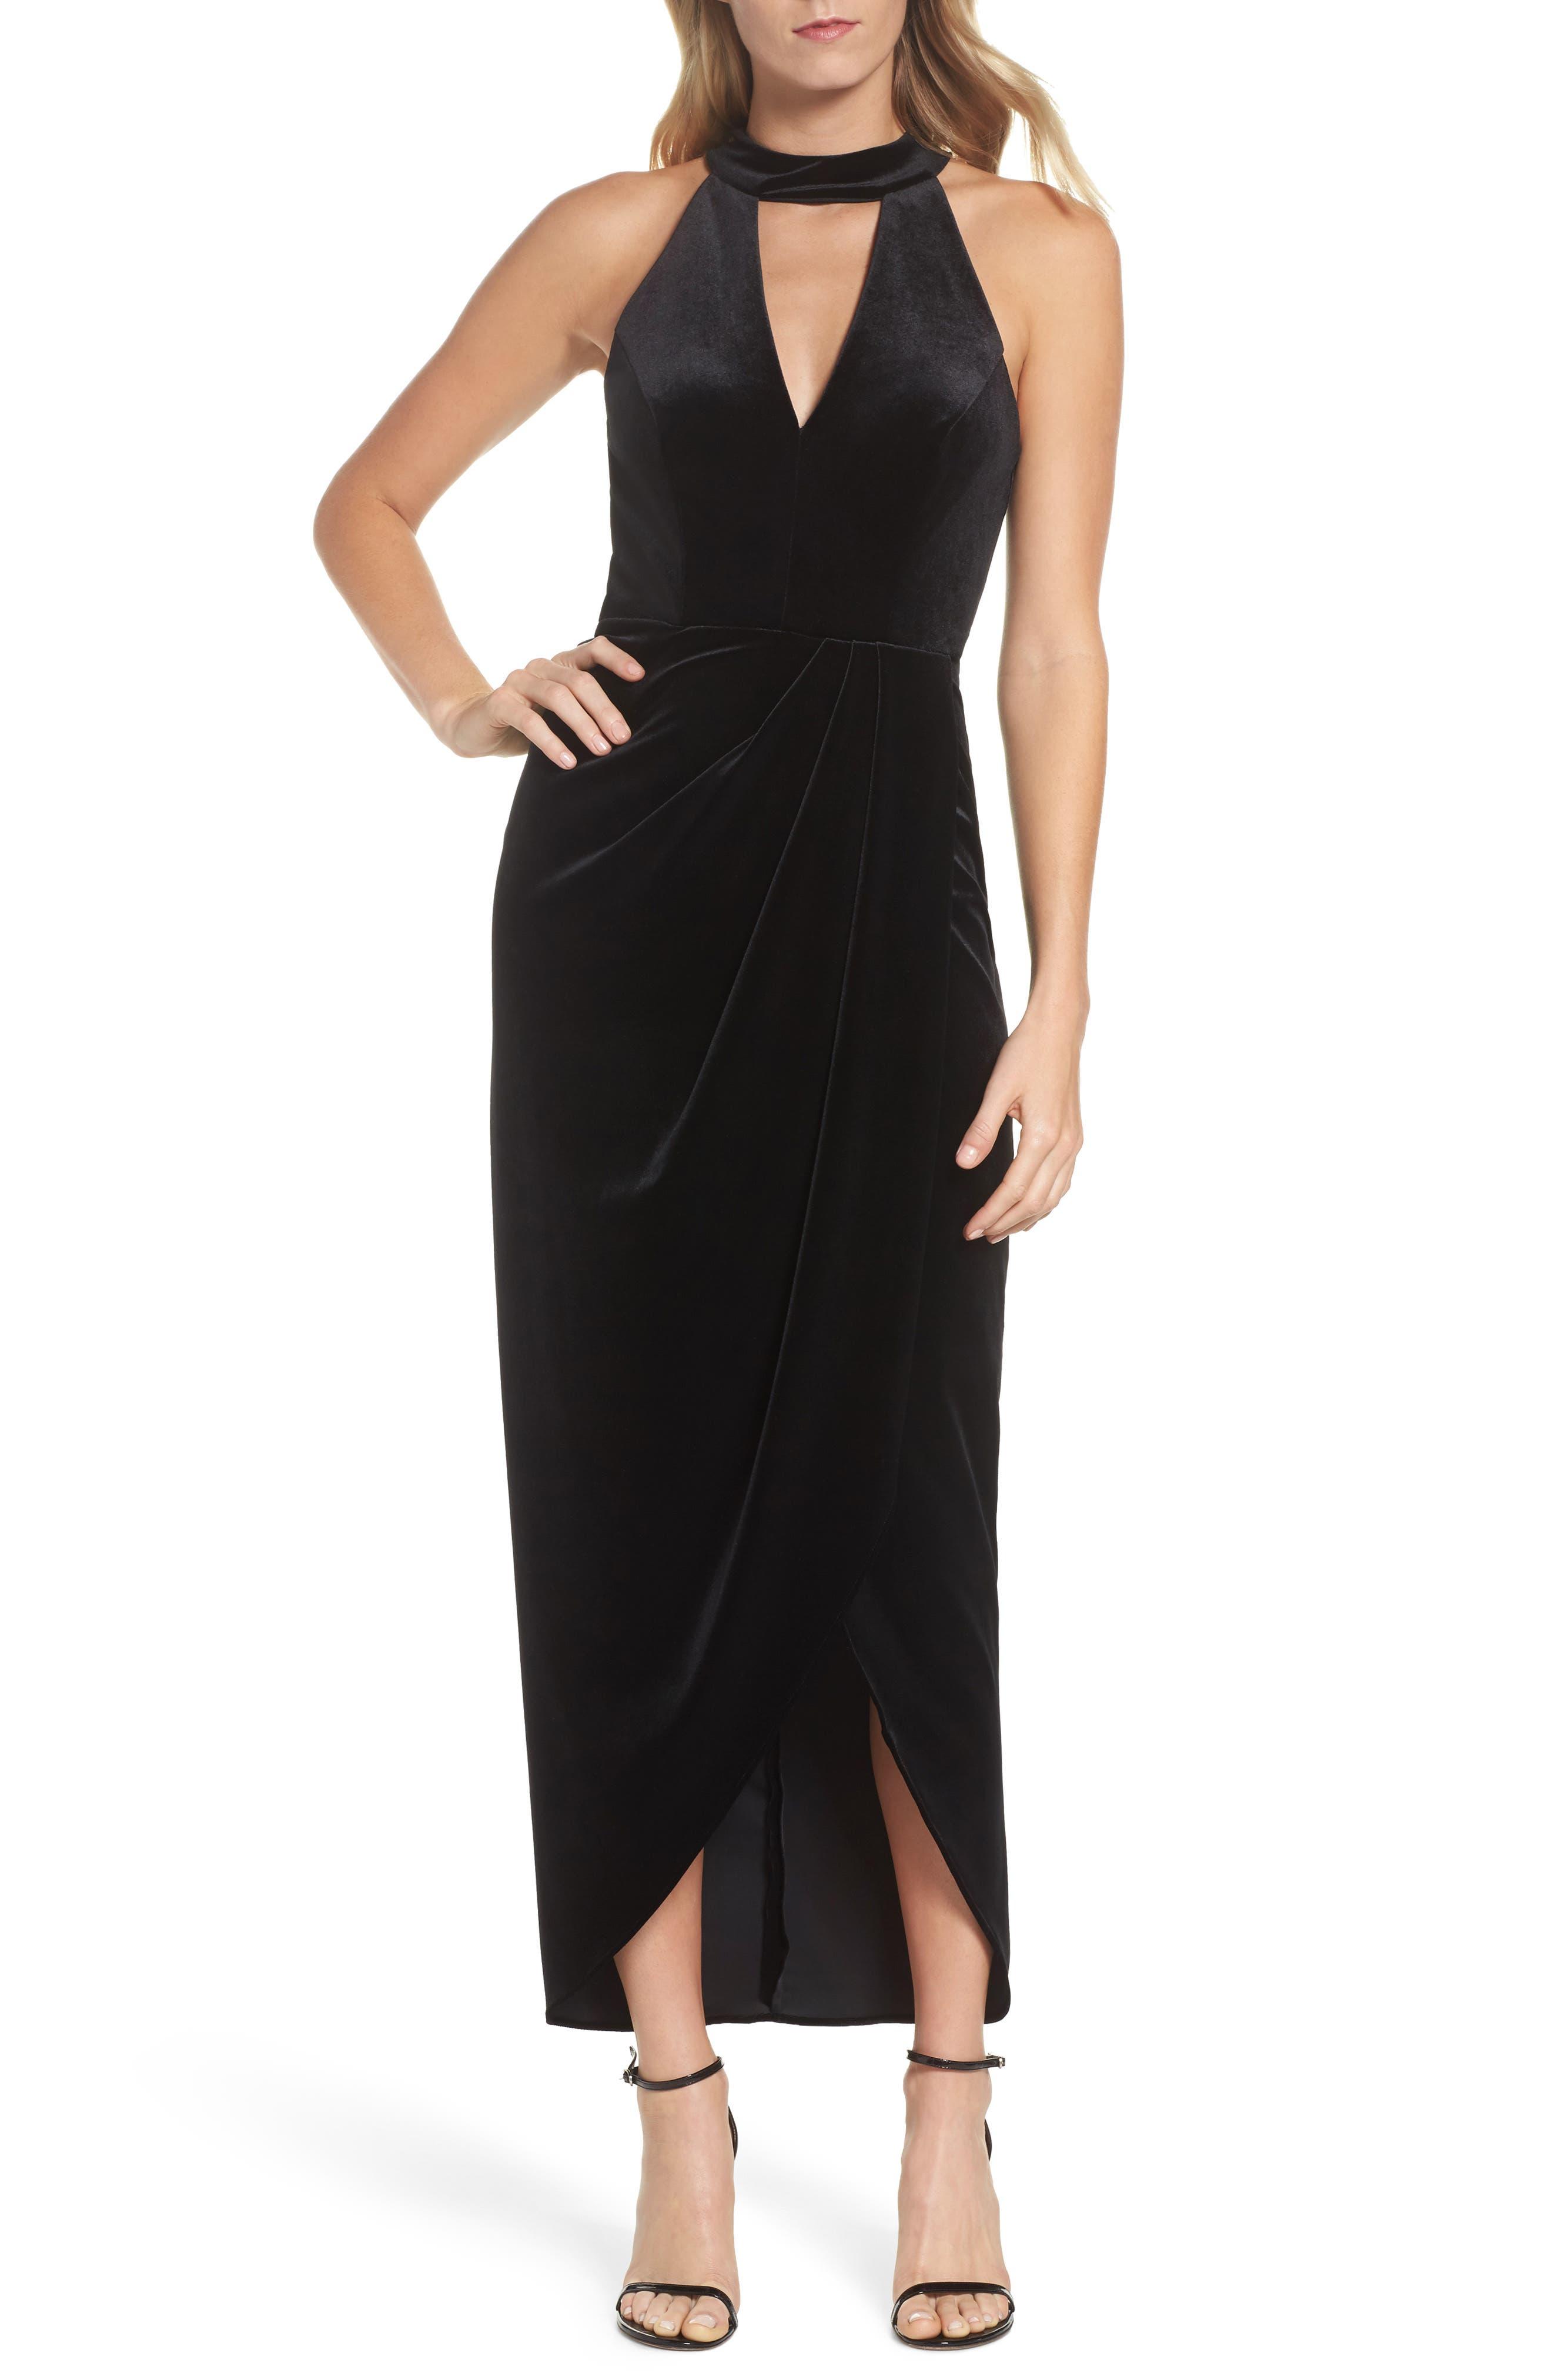 Velvet Choker Neck Wrap Dress,                             Main thumbnail 1, color,                             Black